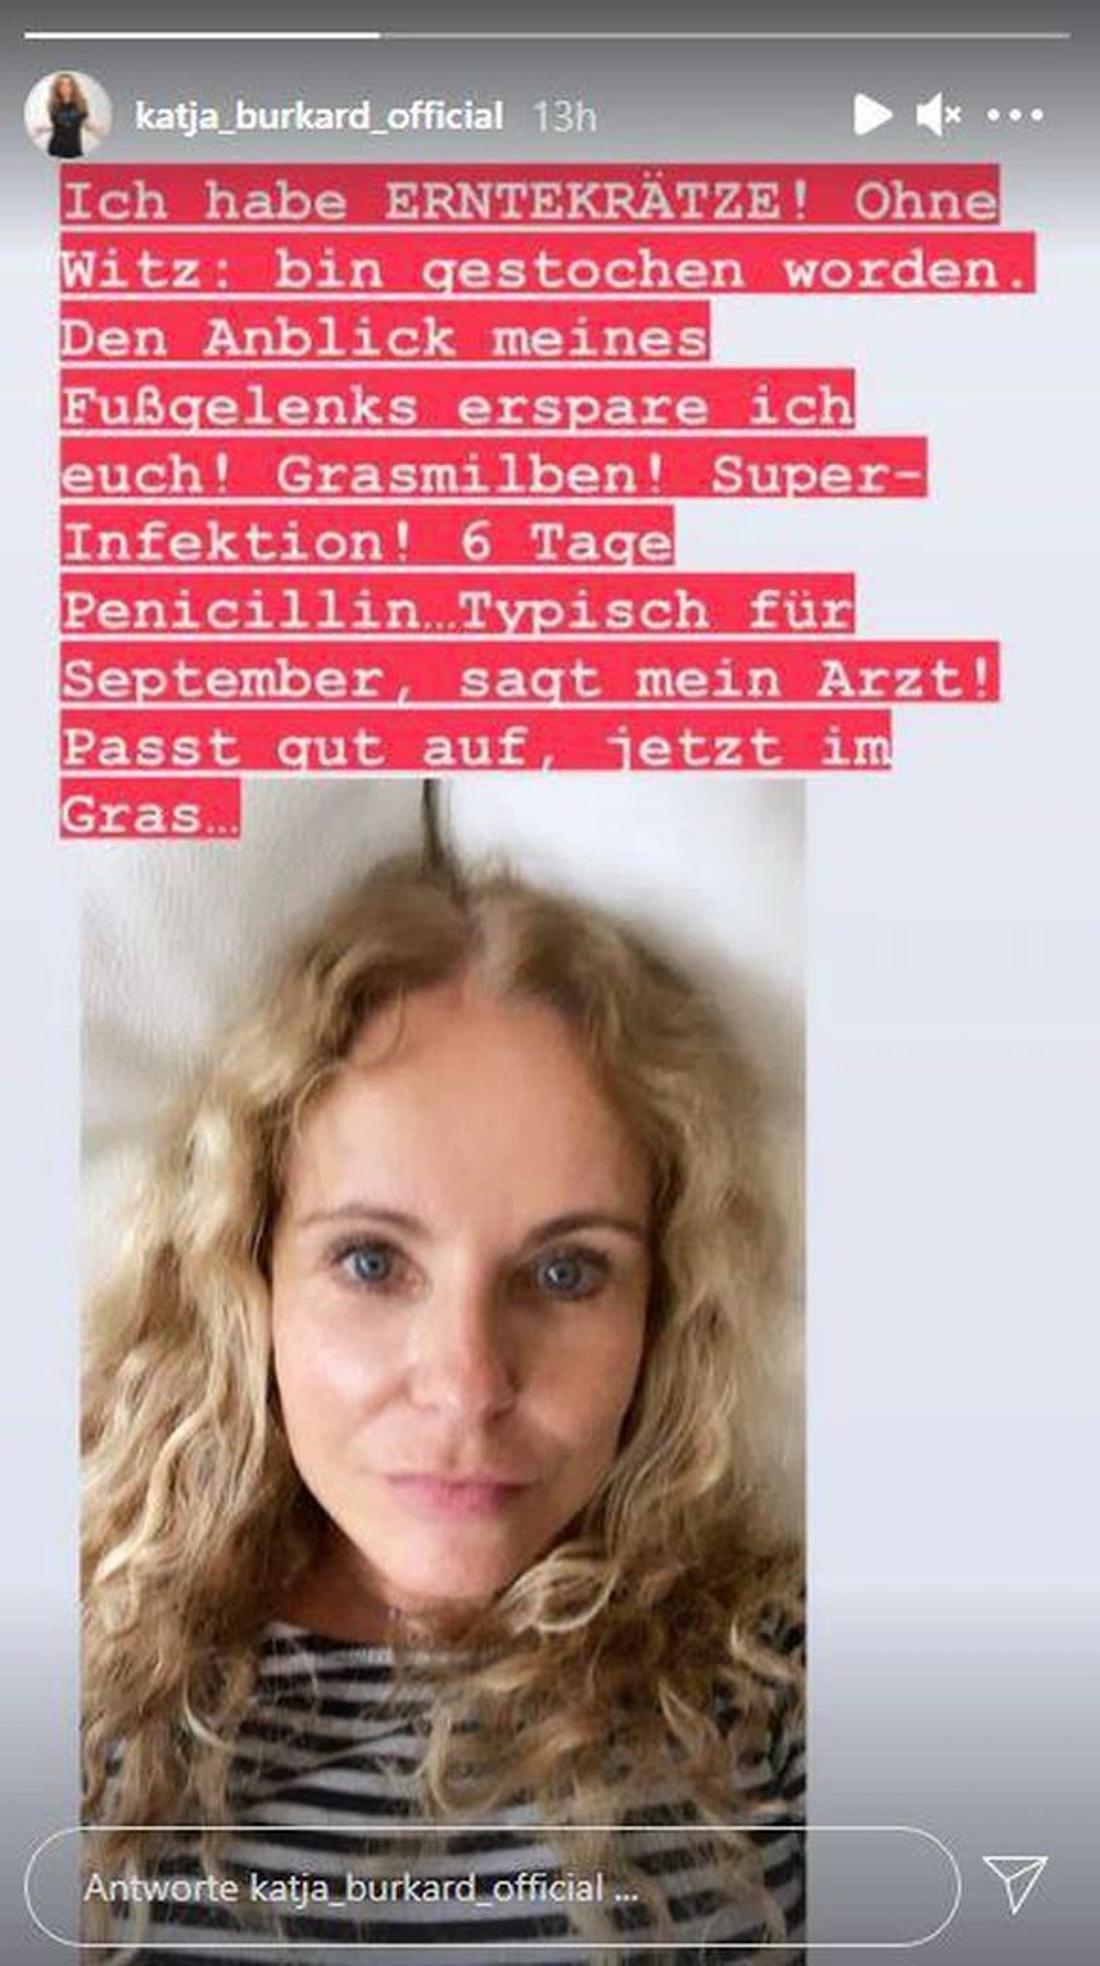 Katja Burkard auf Instagram-Story